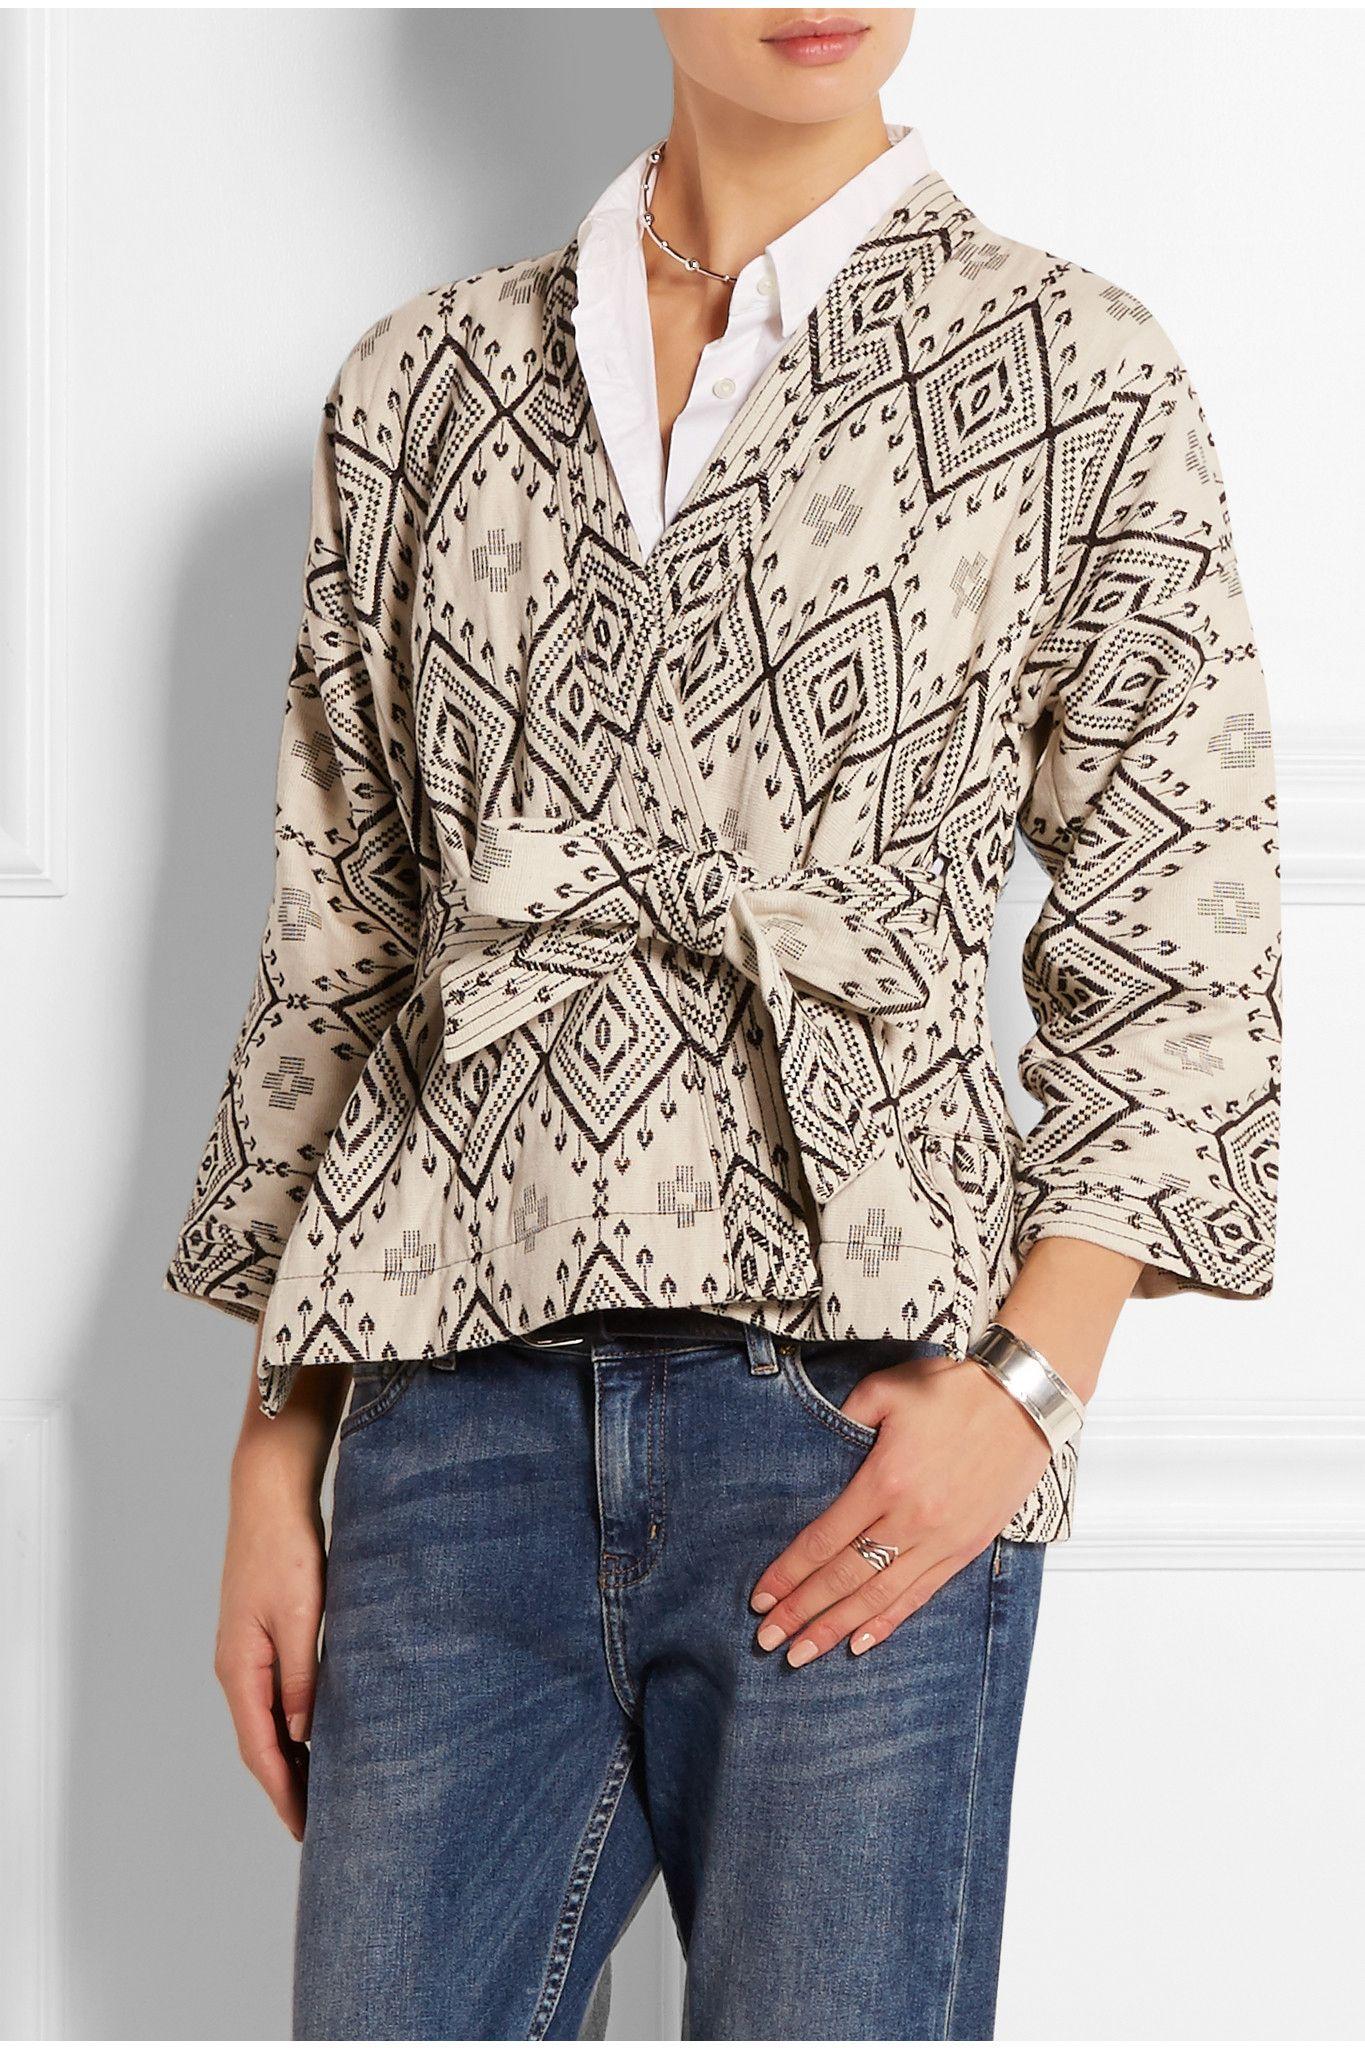 MADEWELL Arrowhead cotton-jacquard jacket $171.87 http://www.net-a-porter.com/products/524823